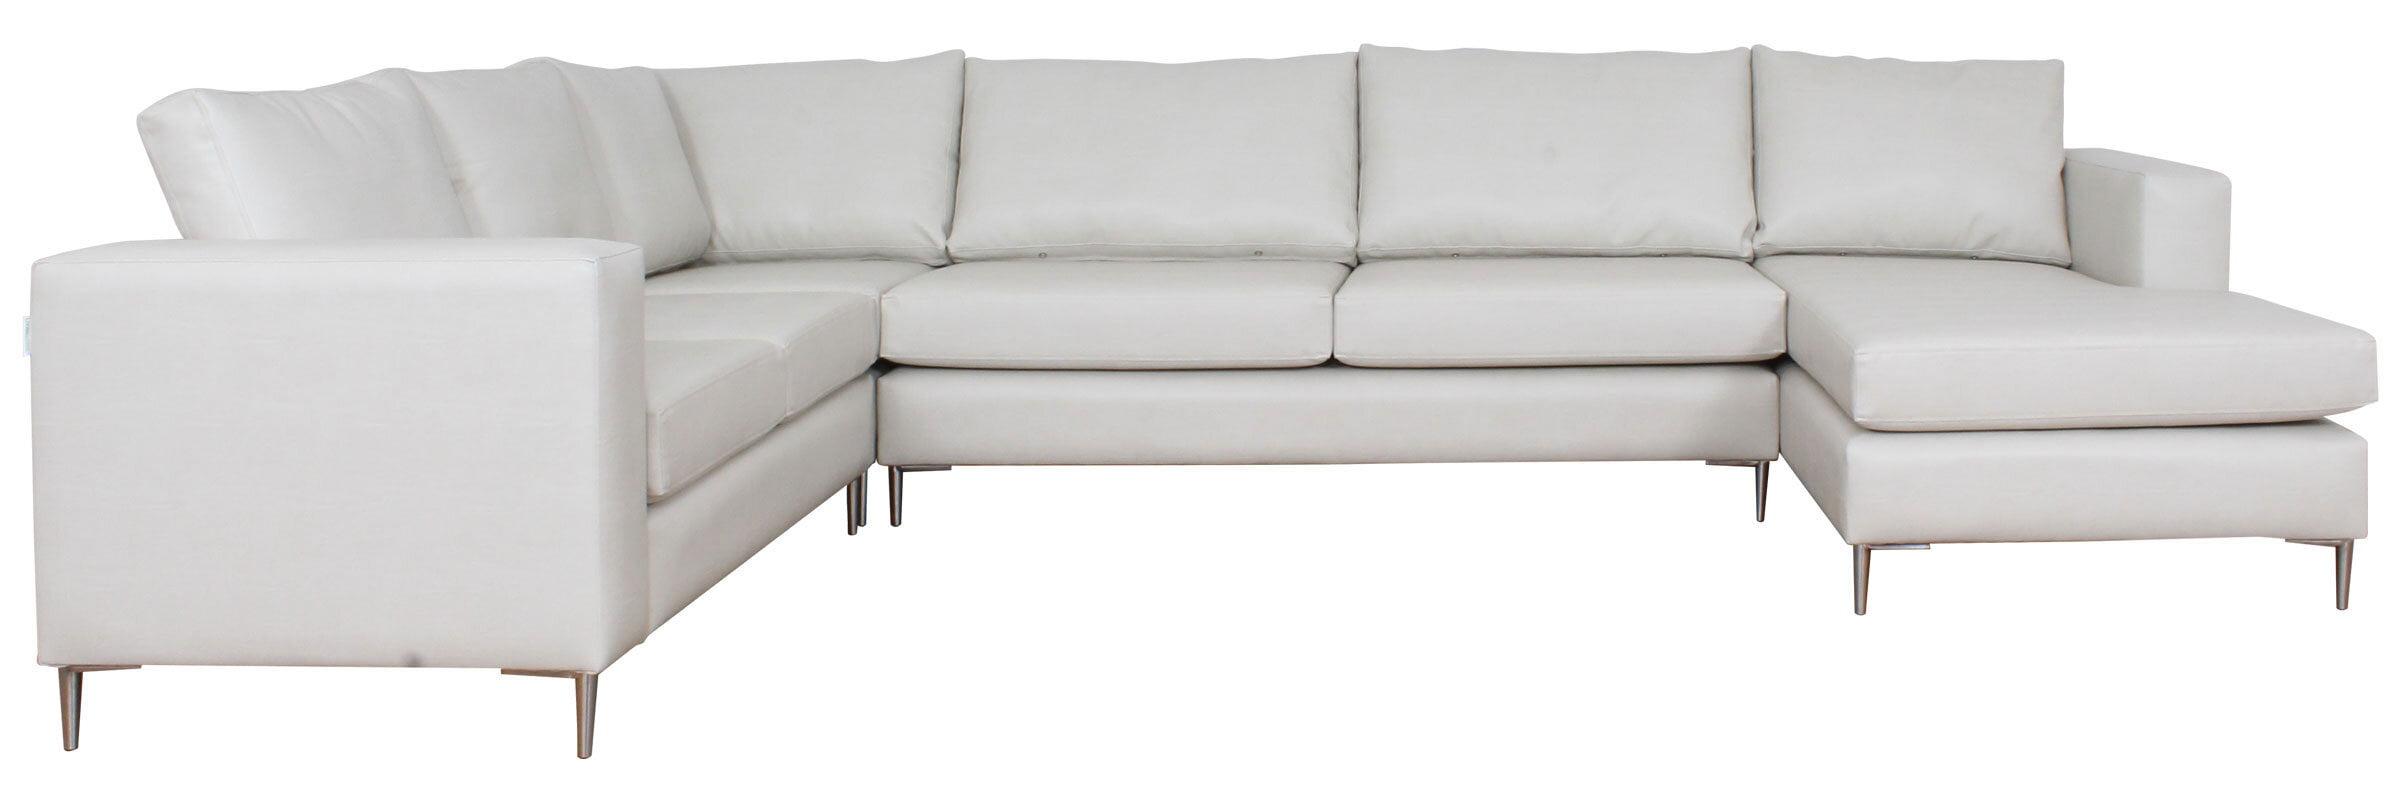 Sofa Modular Pu Blanco